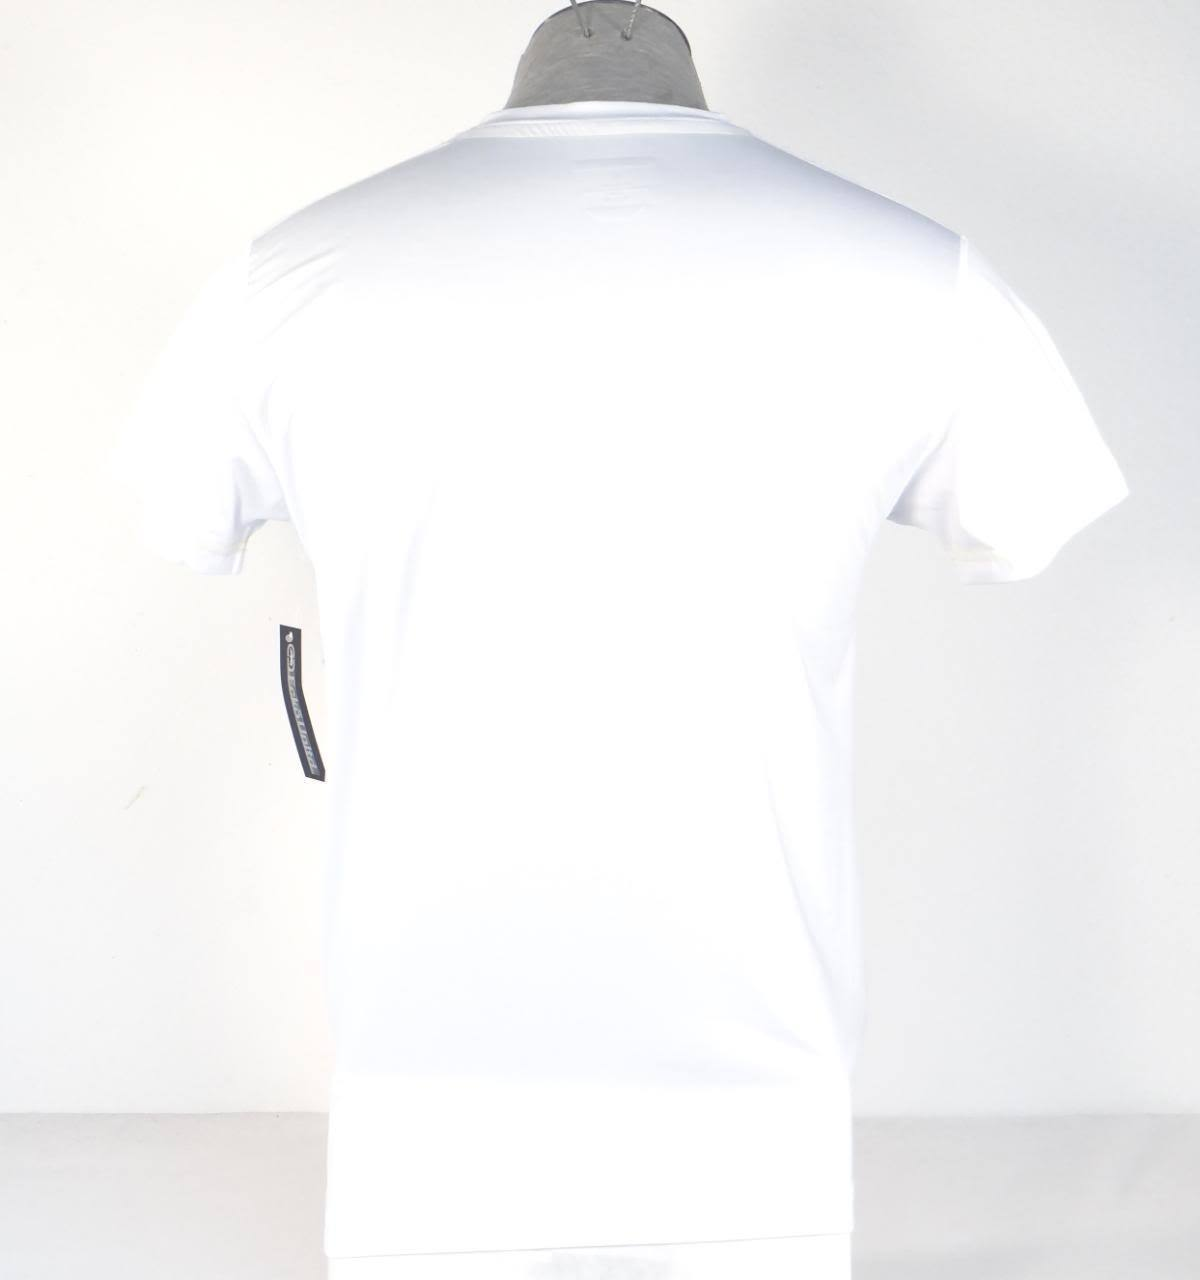 Ecko Unltd Moisture Wicking White Short Sleeve Body Fit Tee Shirt Men's NWT